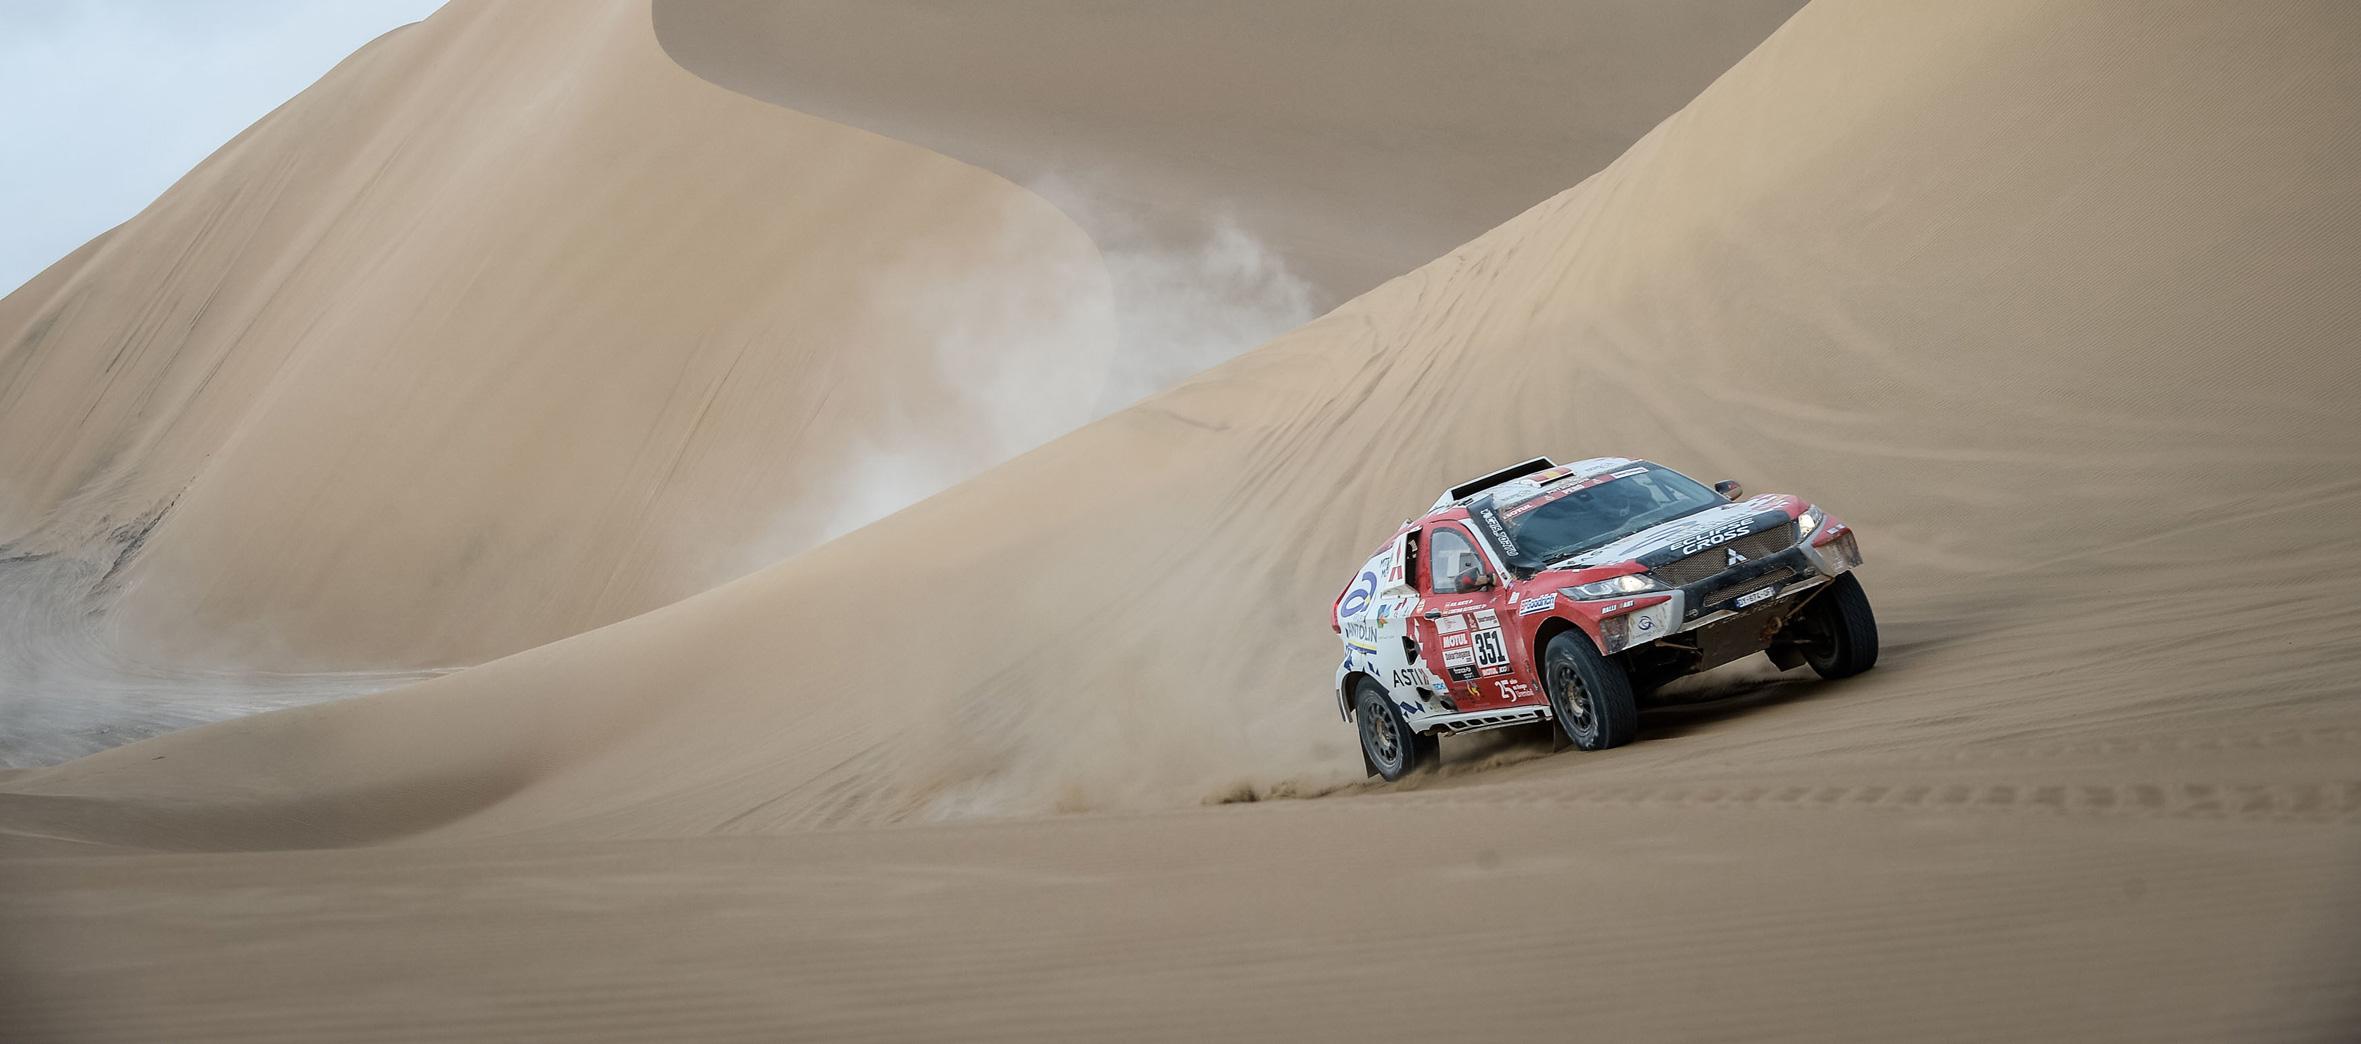 Cristina Gutiérrez vuela sobre las dunas del Dakar